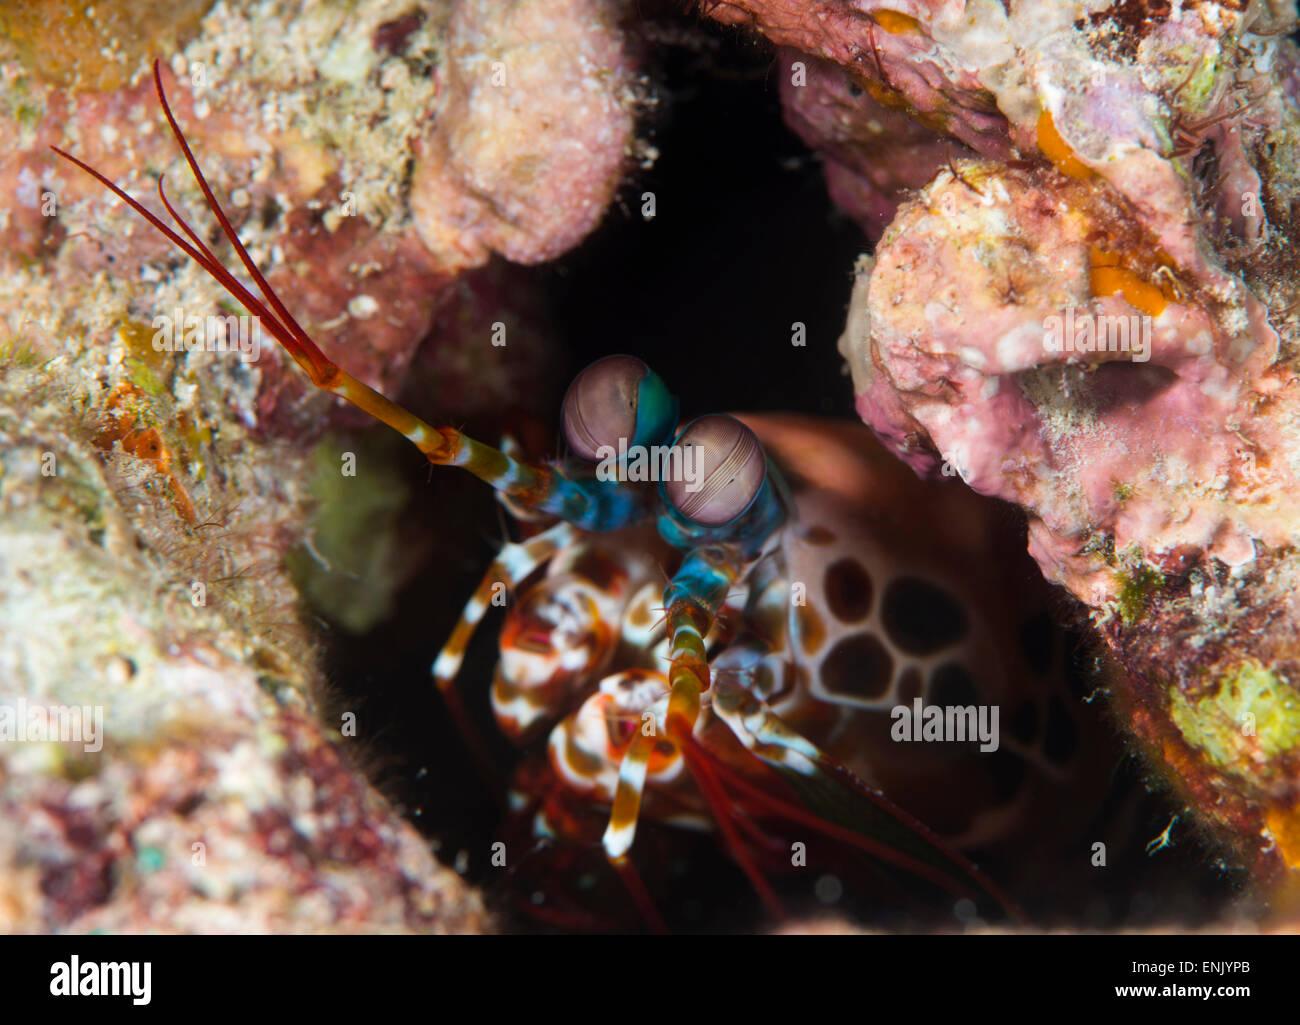 Mantis shrimp (Gonodactylus sp.), a hole dwelling crustacean, Queensland, Australia, Pacific - Stock Image